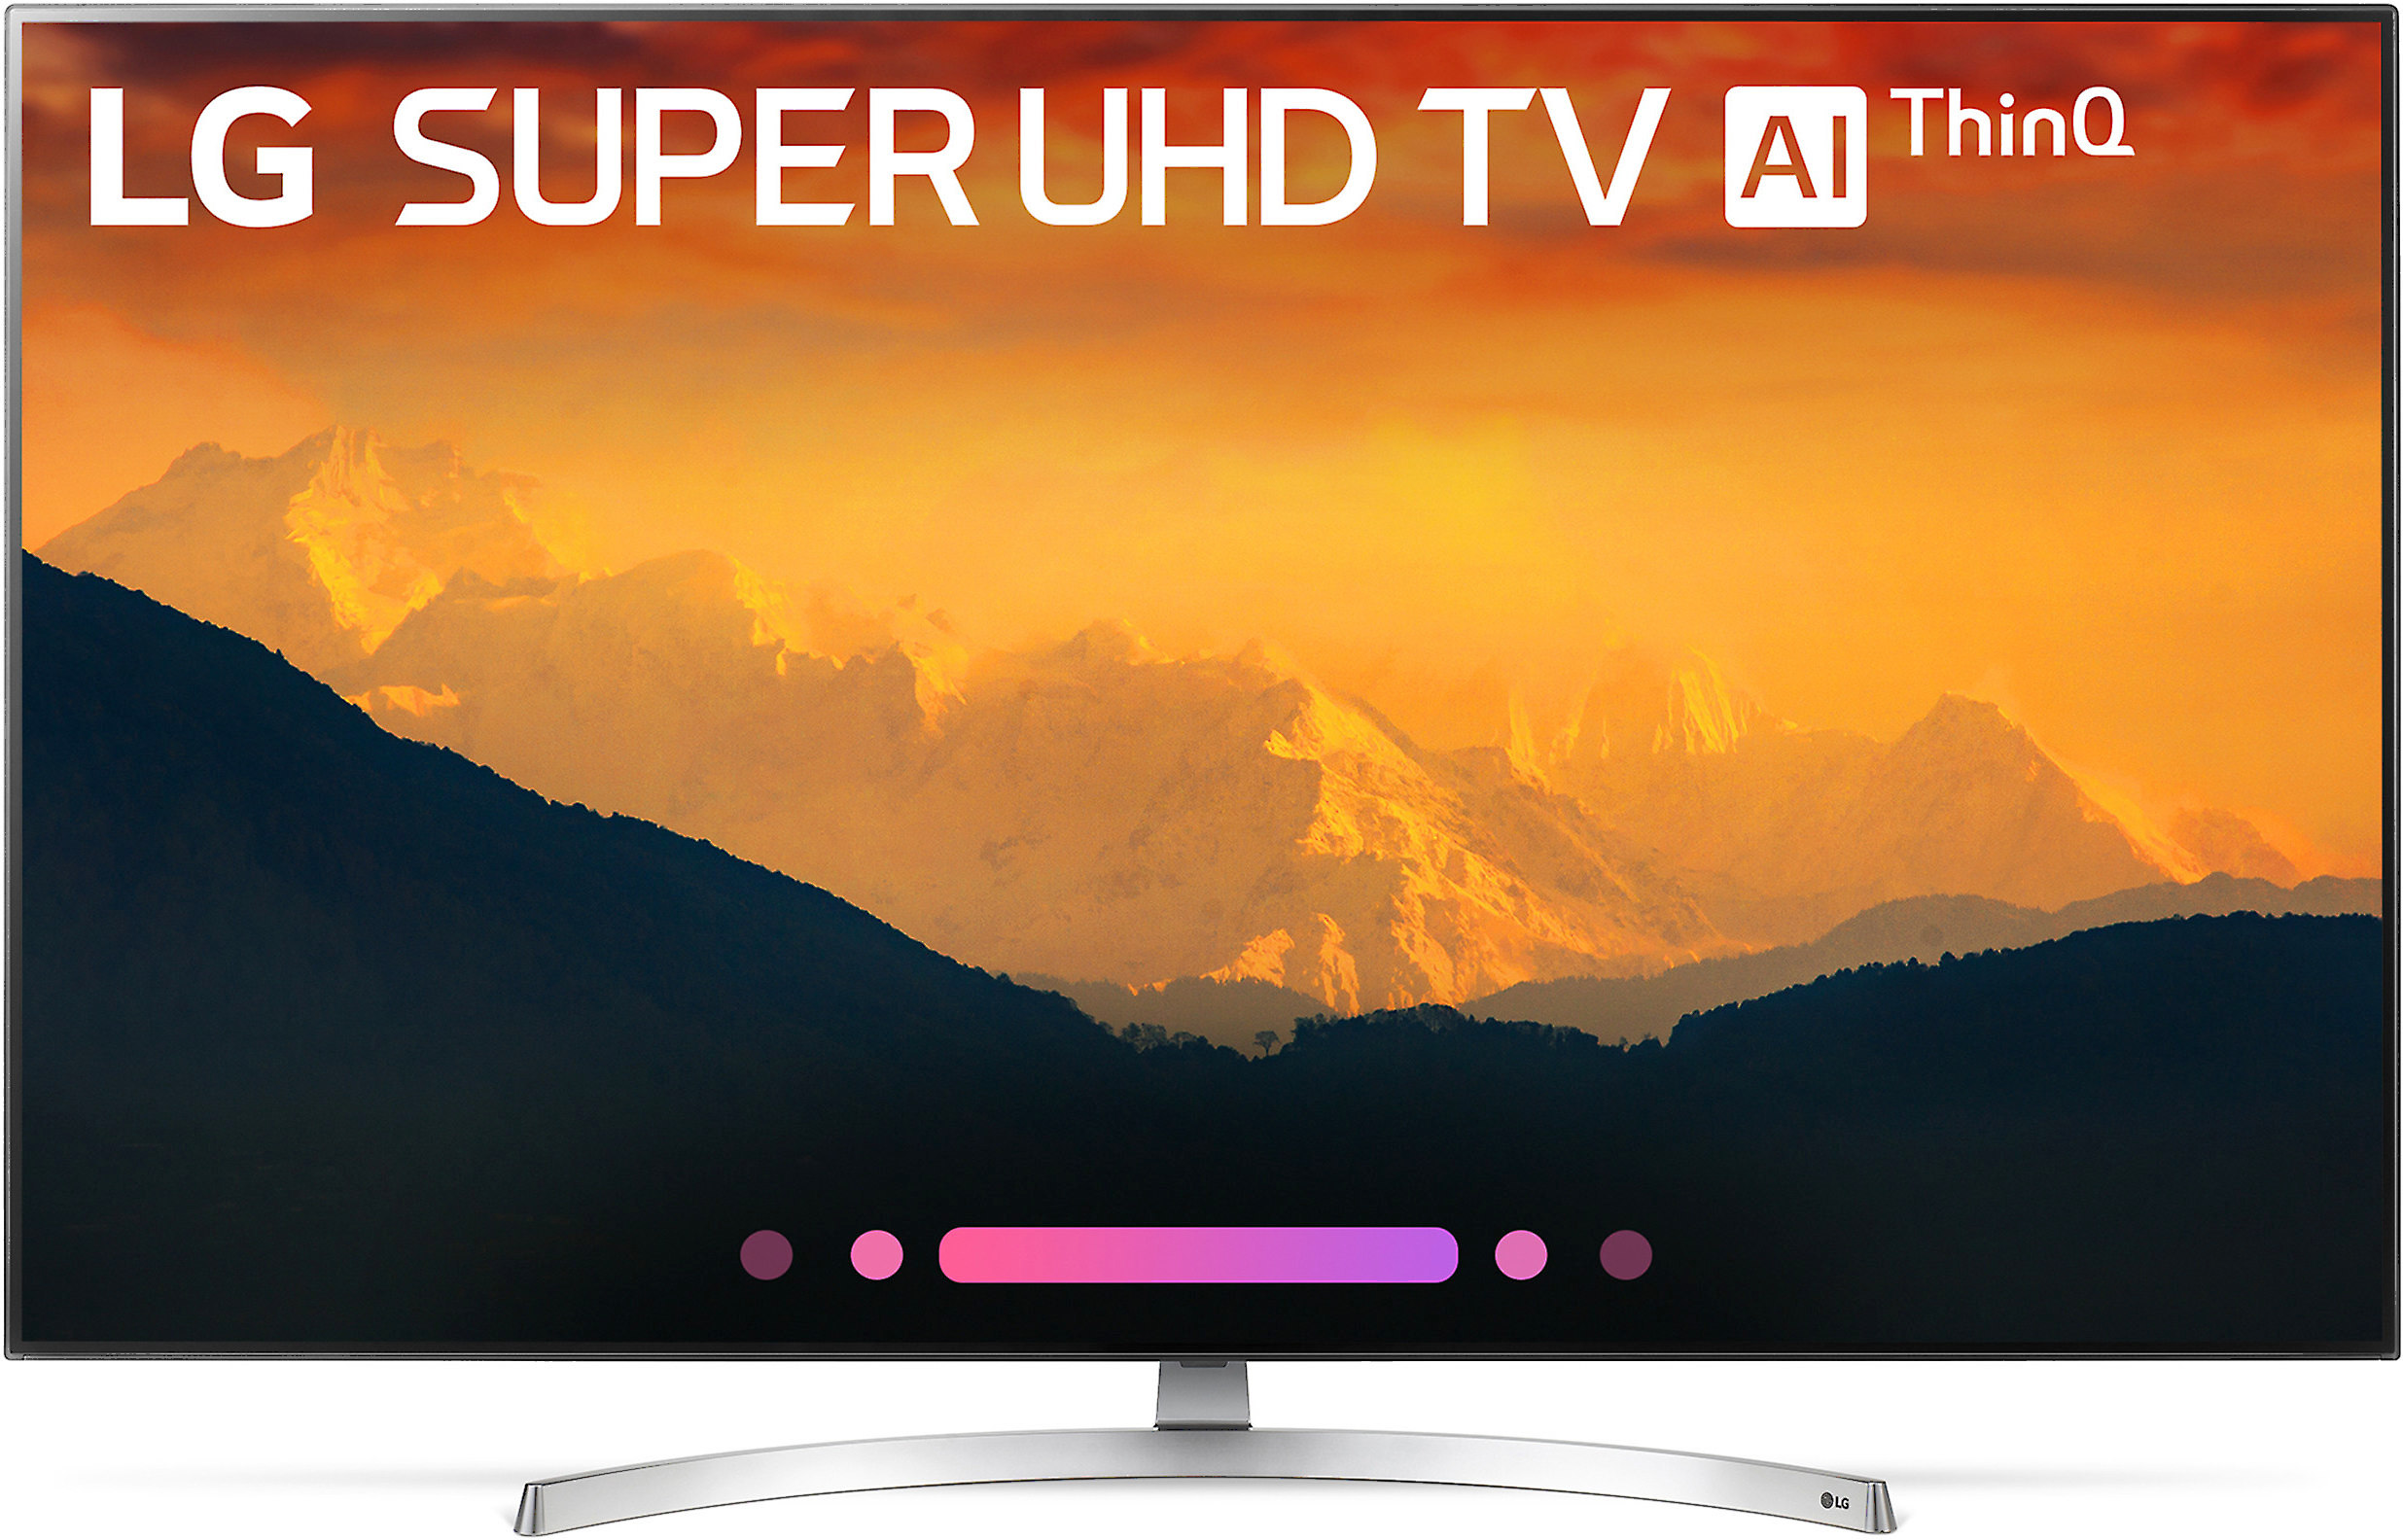 how do i install hulu on my lg tv